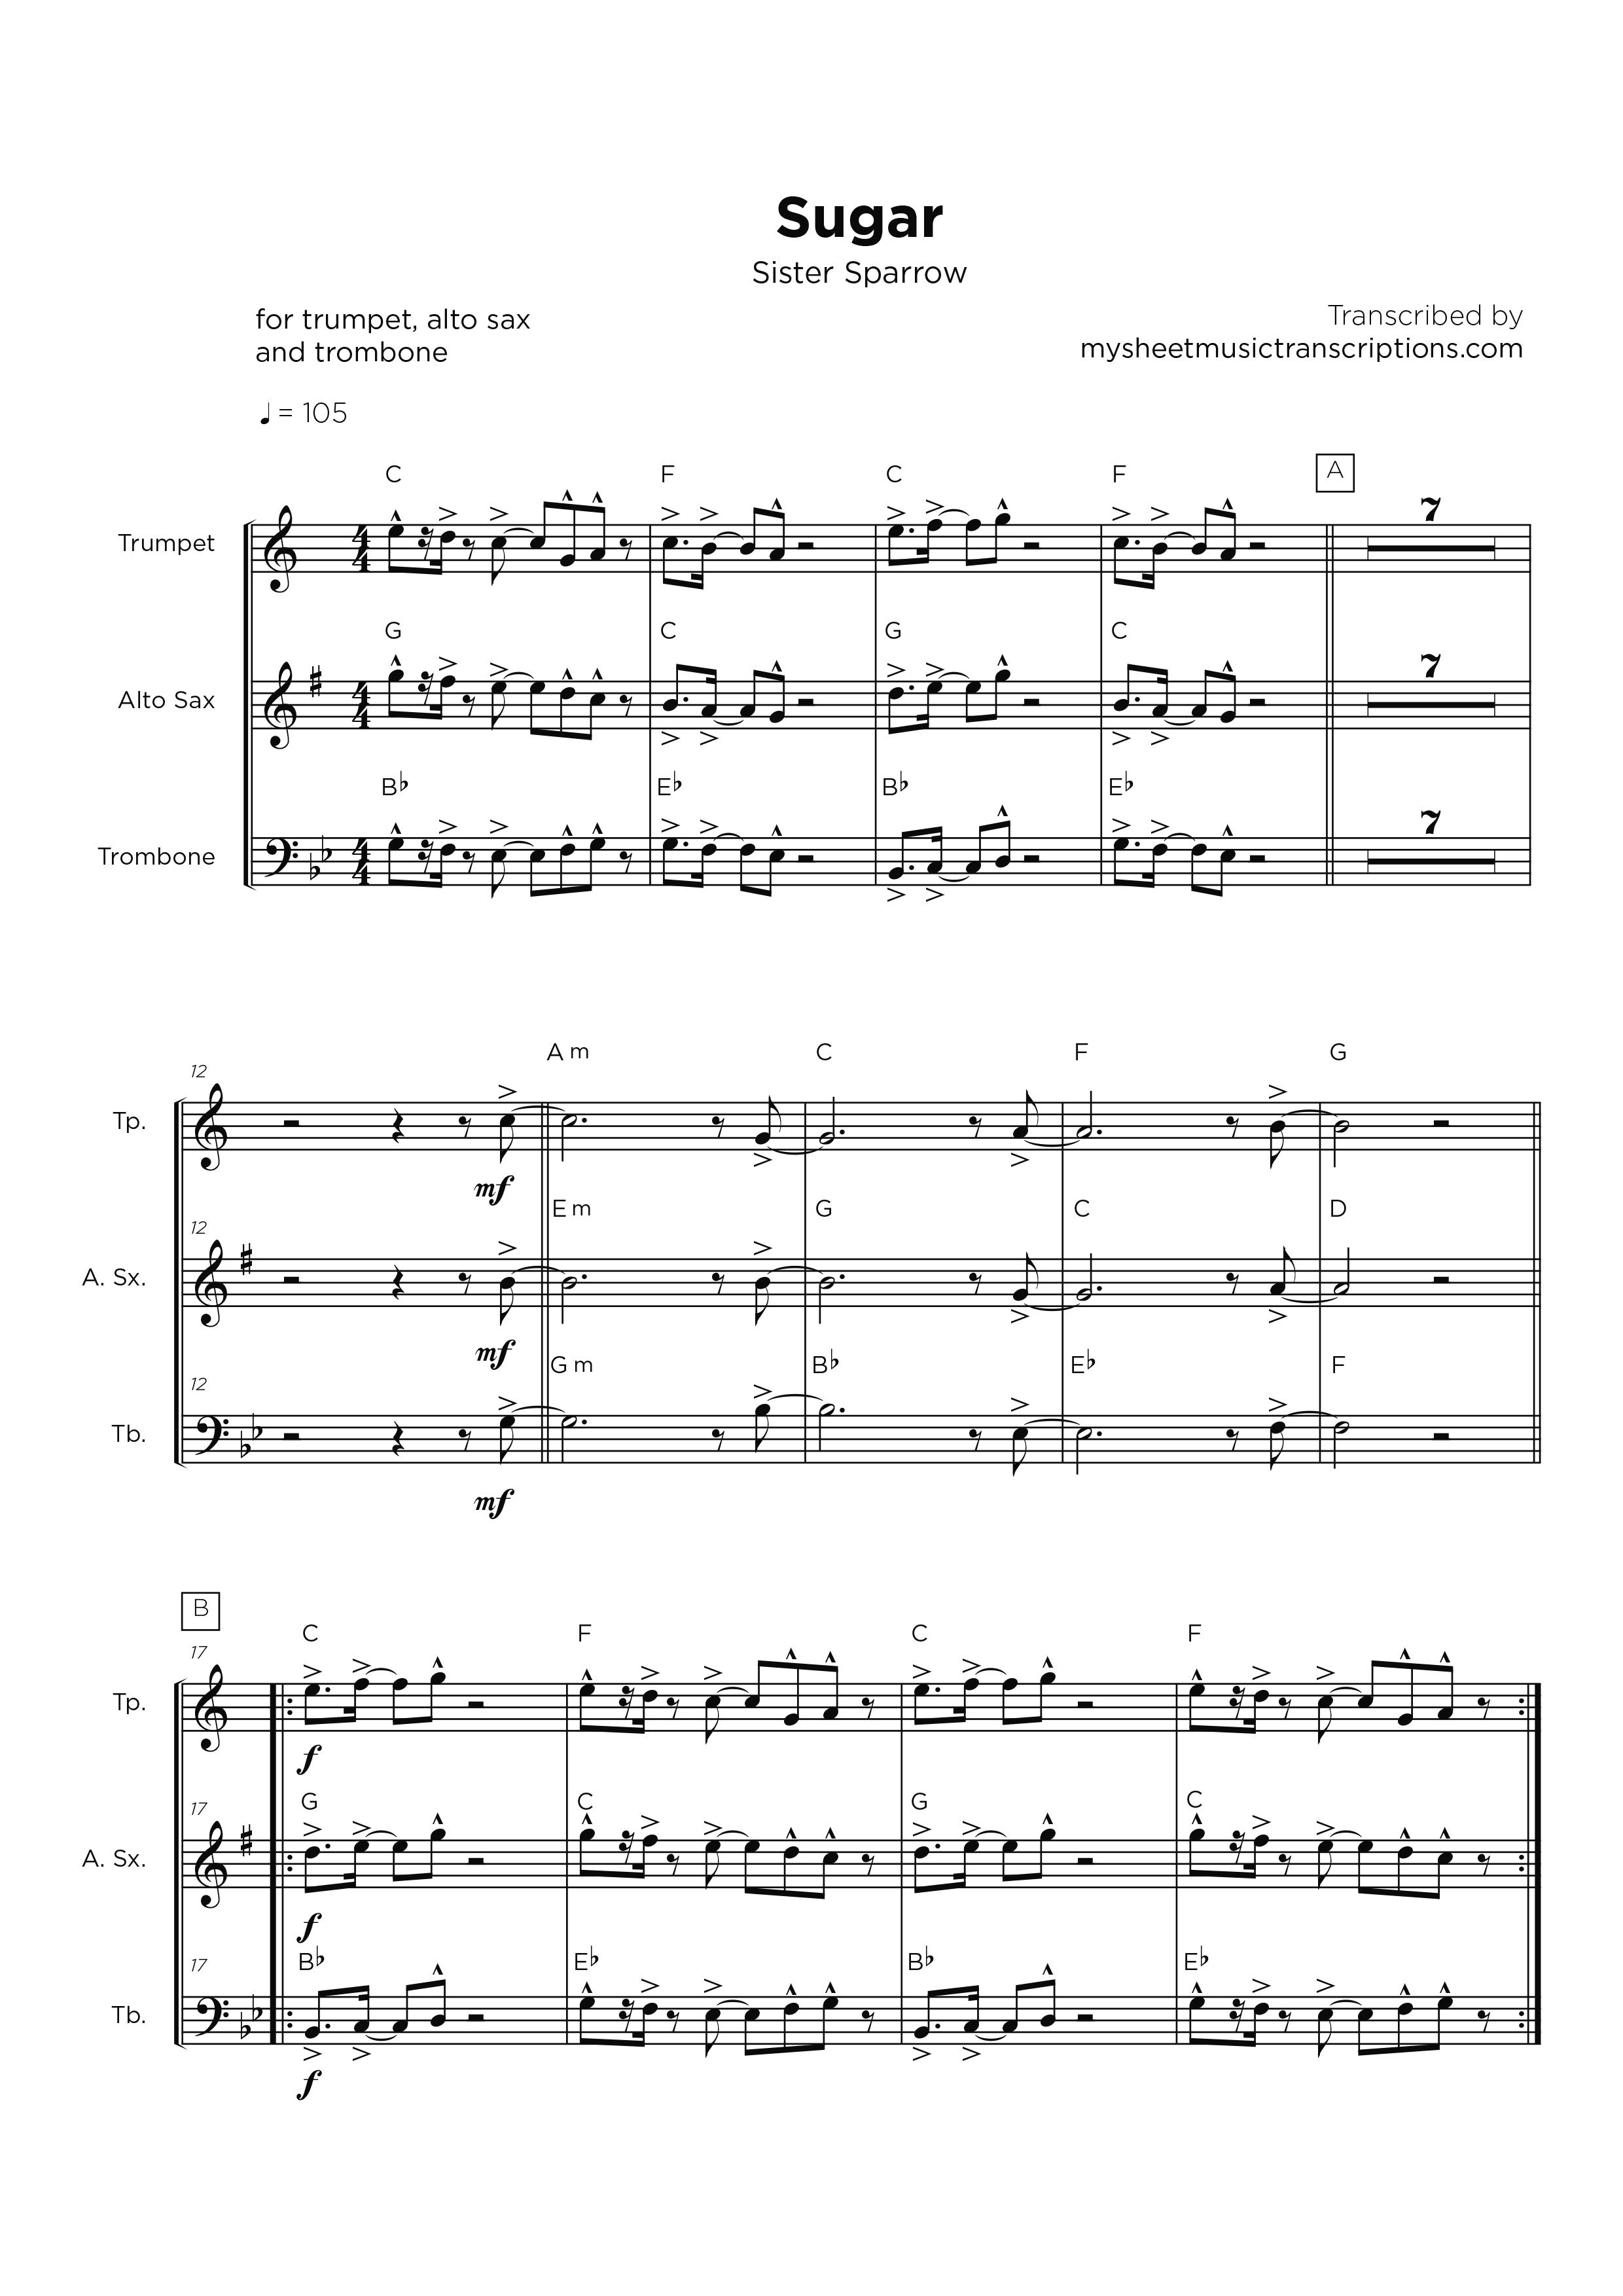 Sugar - Sister Sparrow - Horn section sheet music